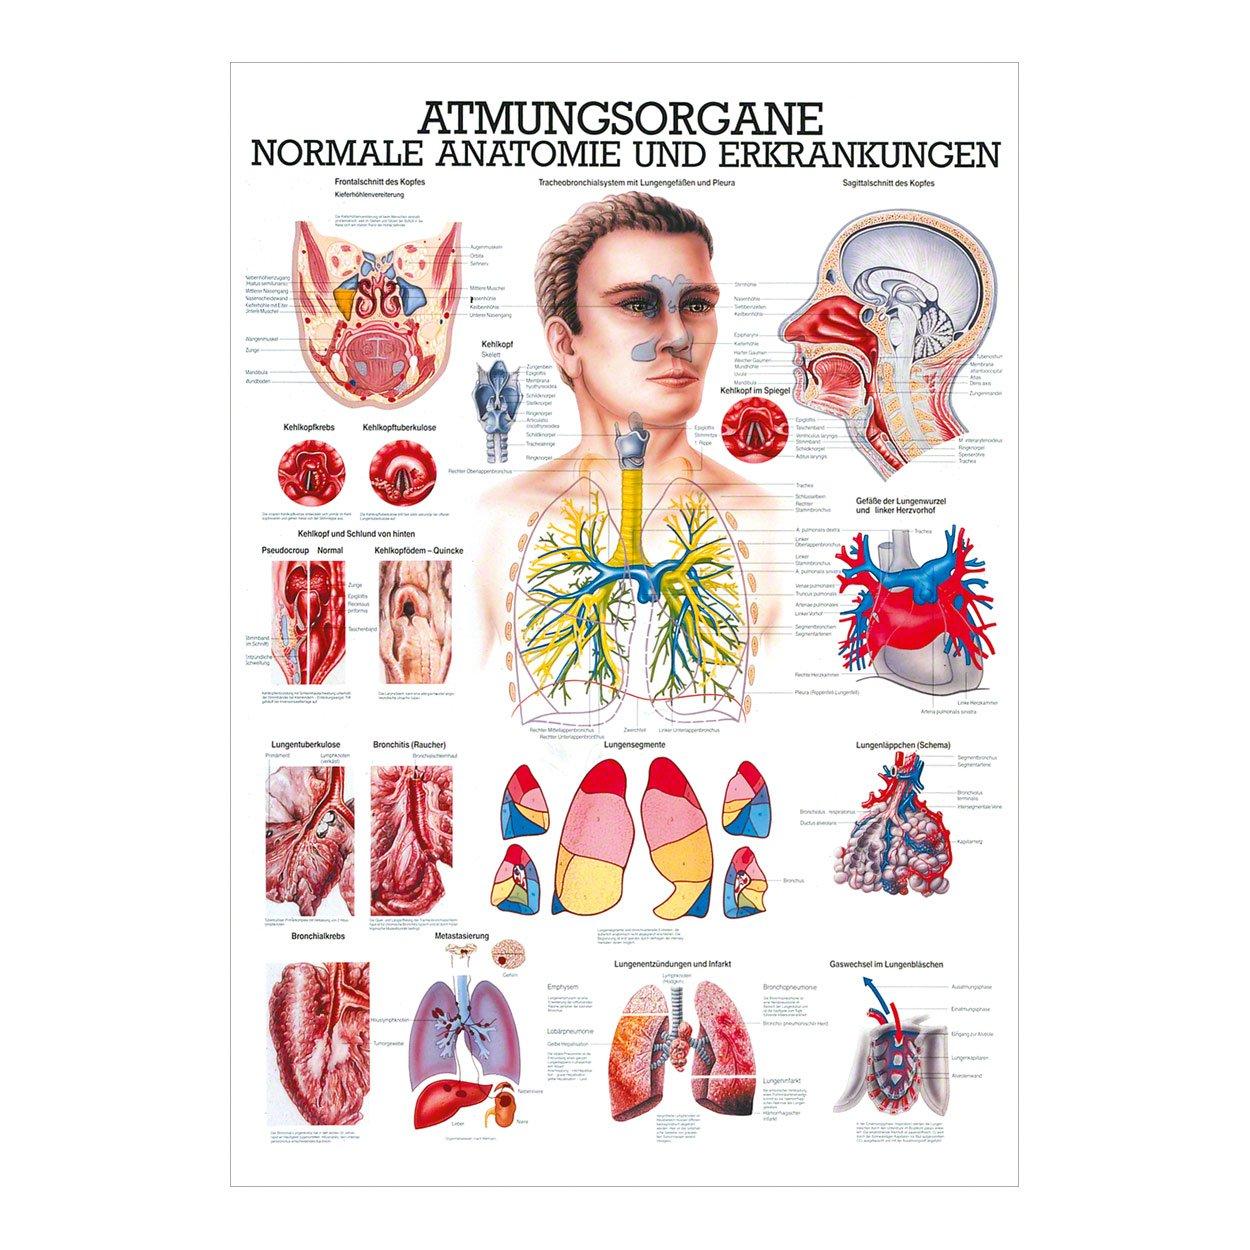 Atmungsorgane Mini-Poster Anatomie 34x24 cm medizinische Lehrmittel ...